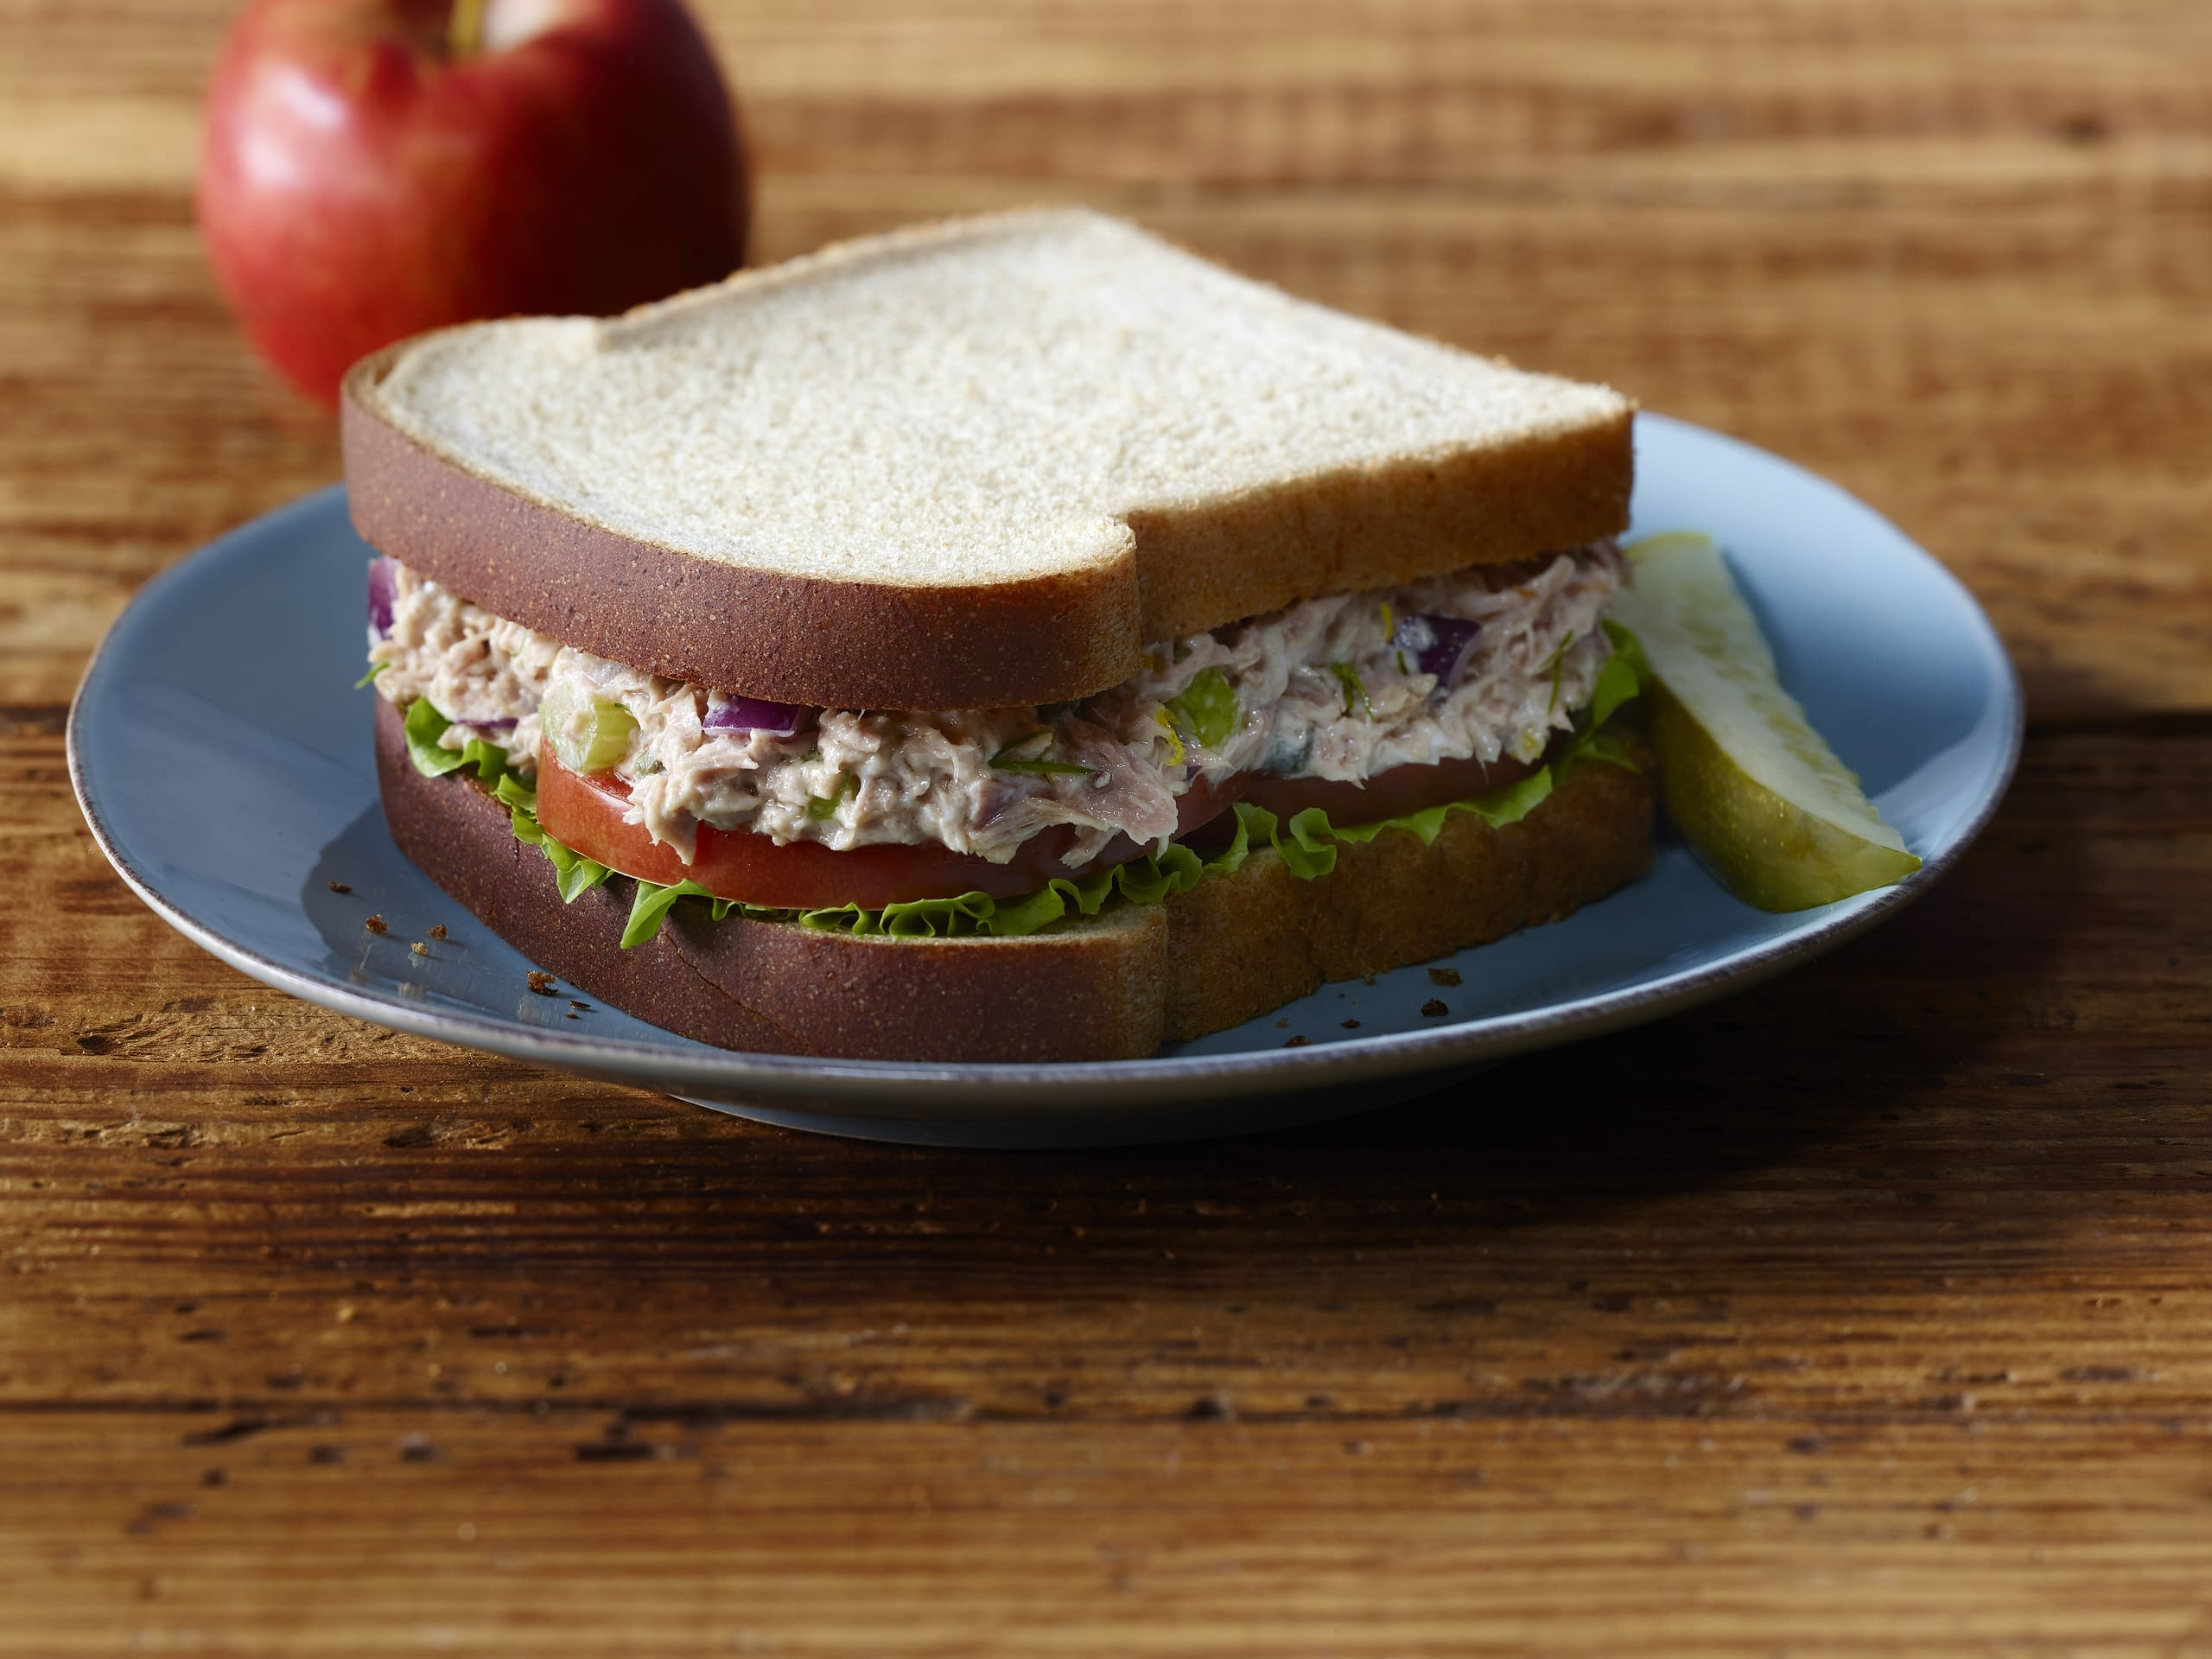 Nicoise Style Tuna Salad Sandwich Meal Idea Panera At Home